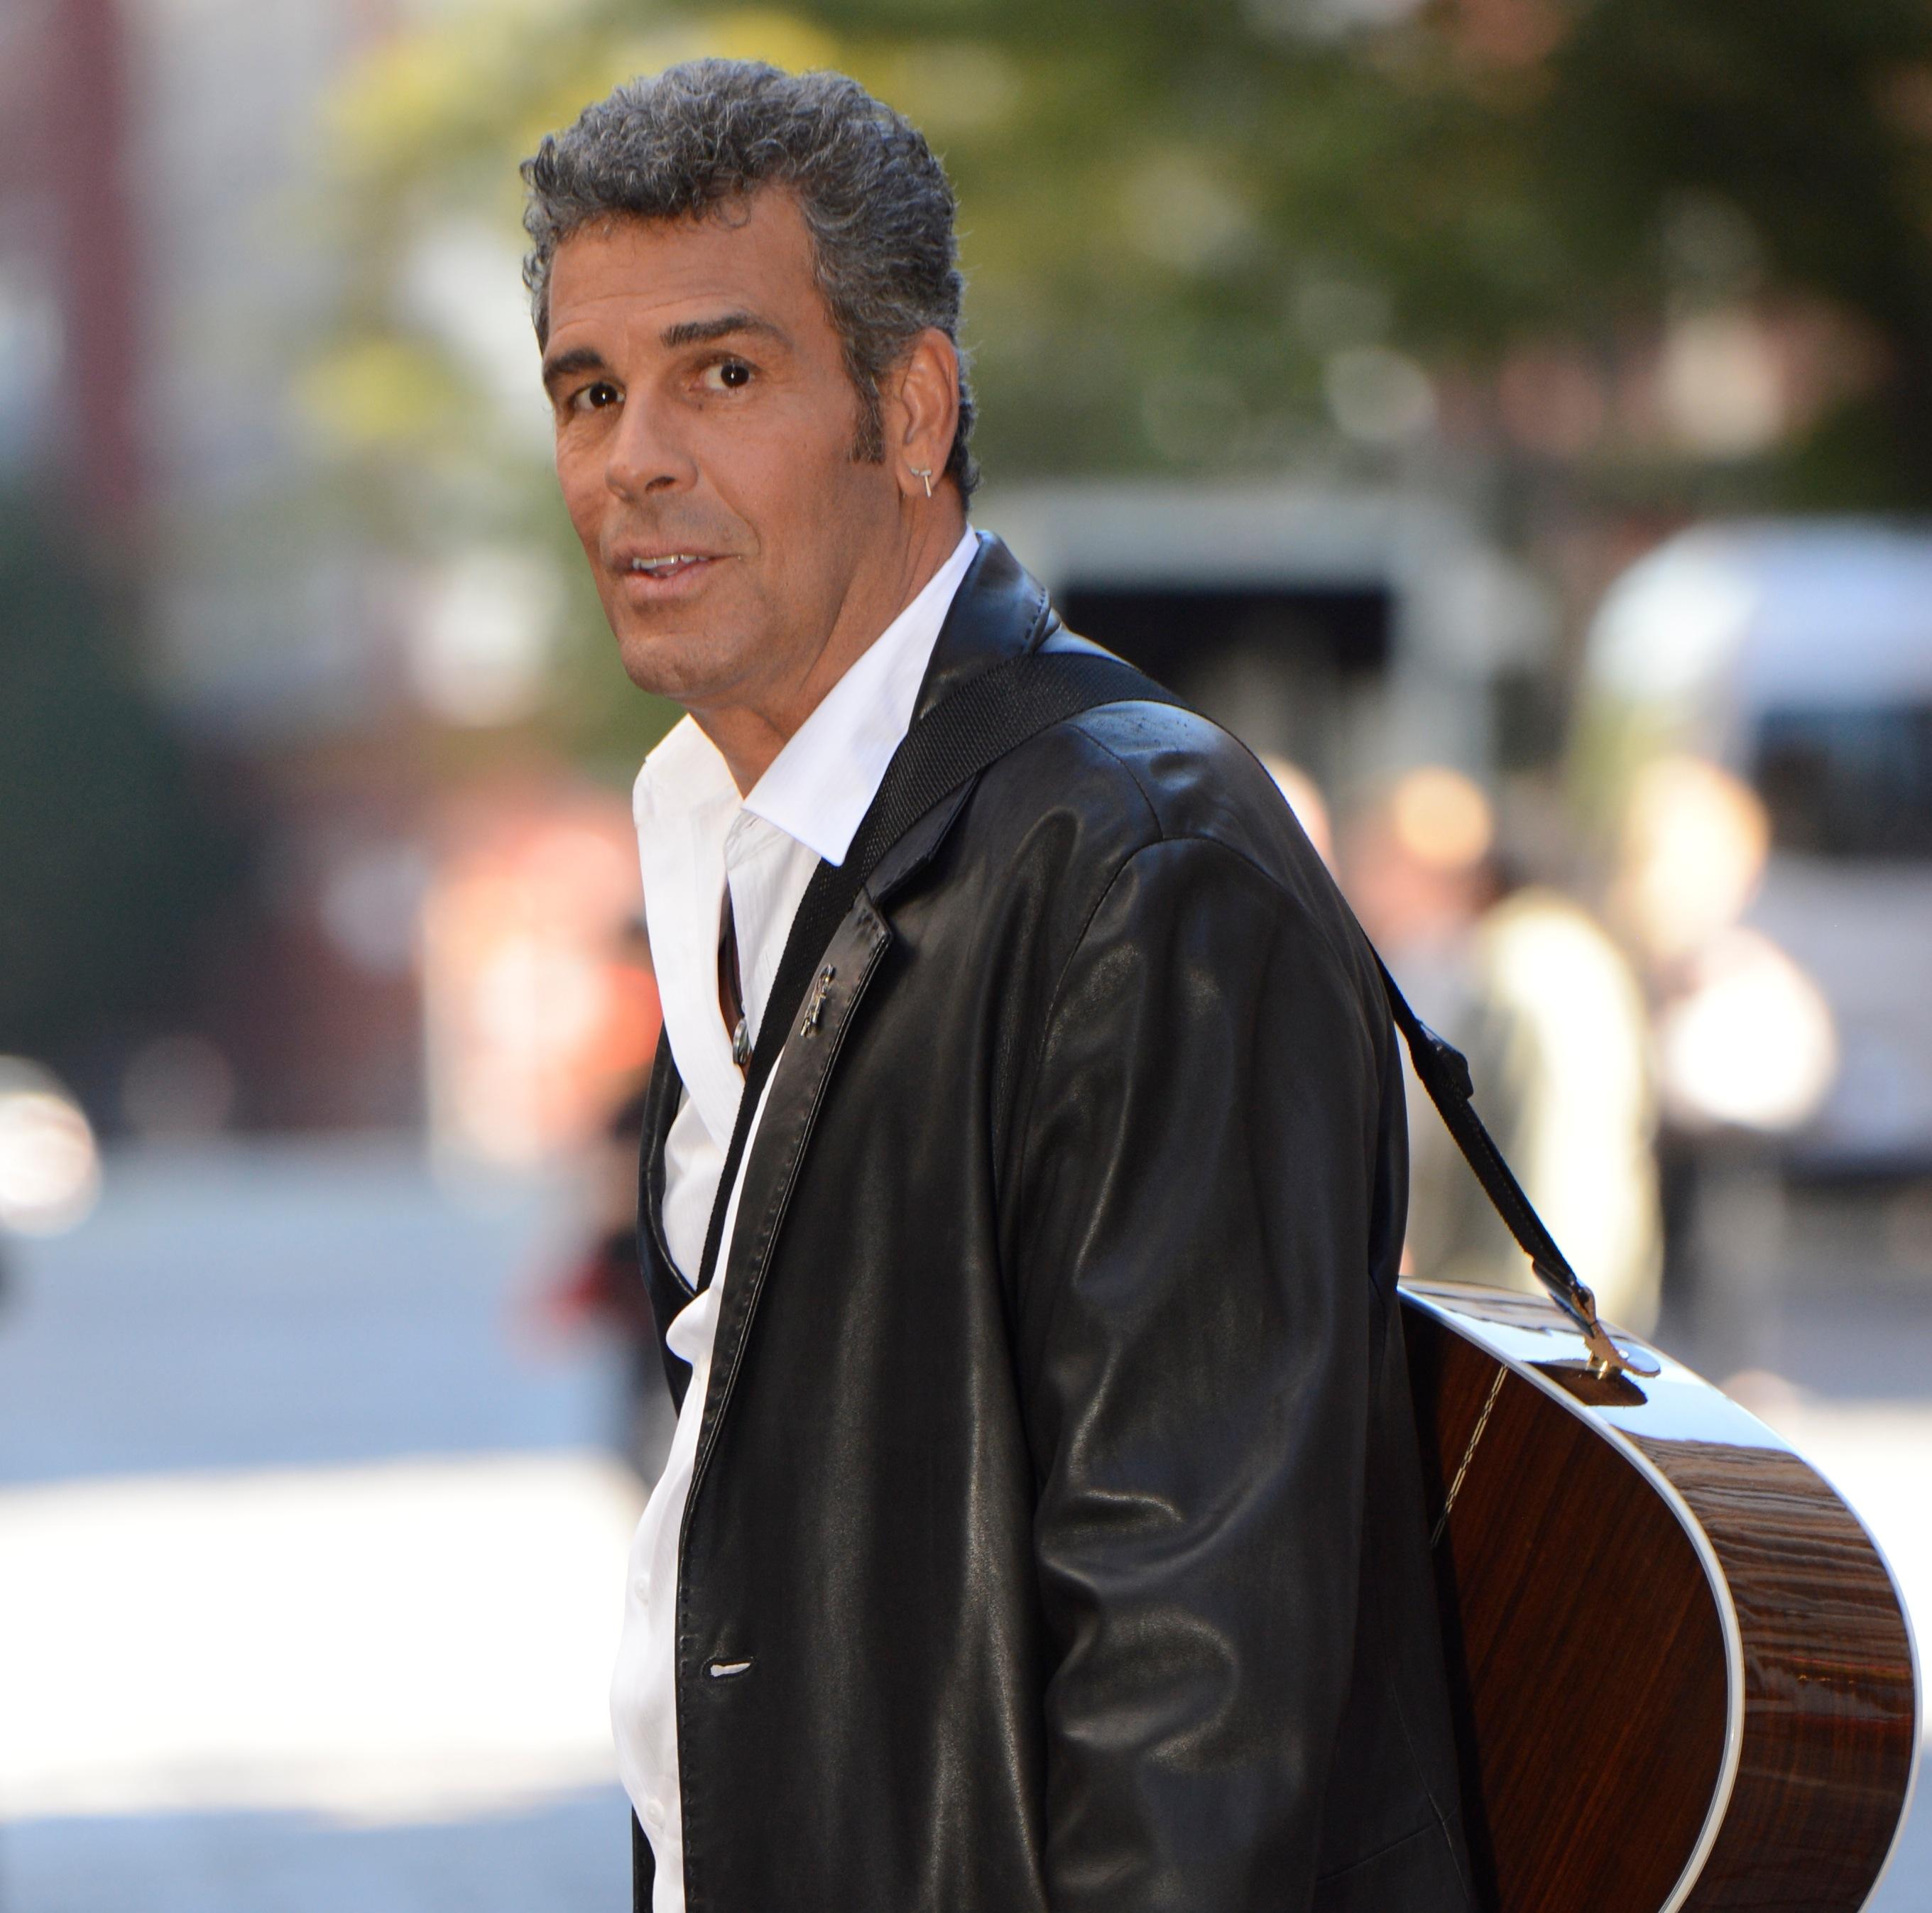 Mark Rivera S New Album Quot Common Bond Quot To Be Released